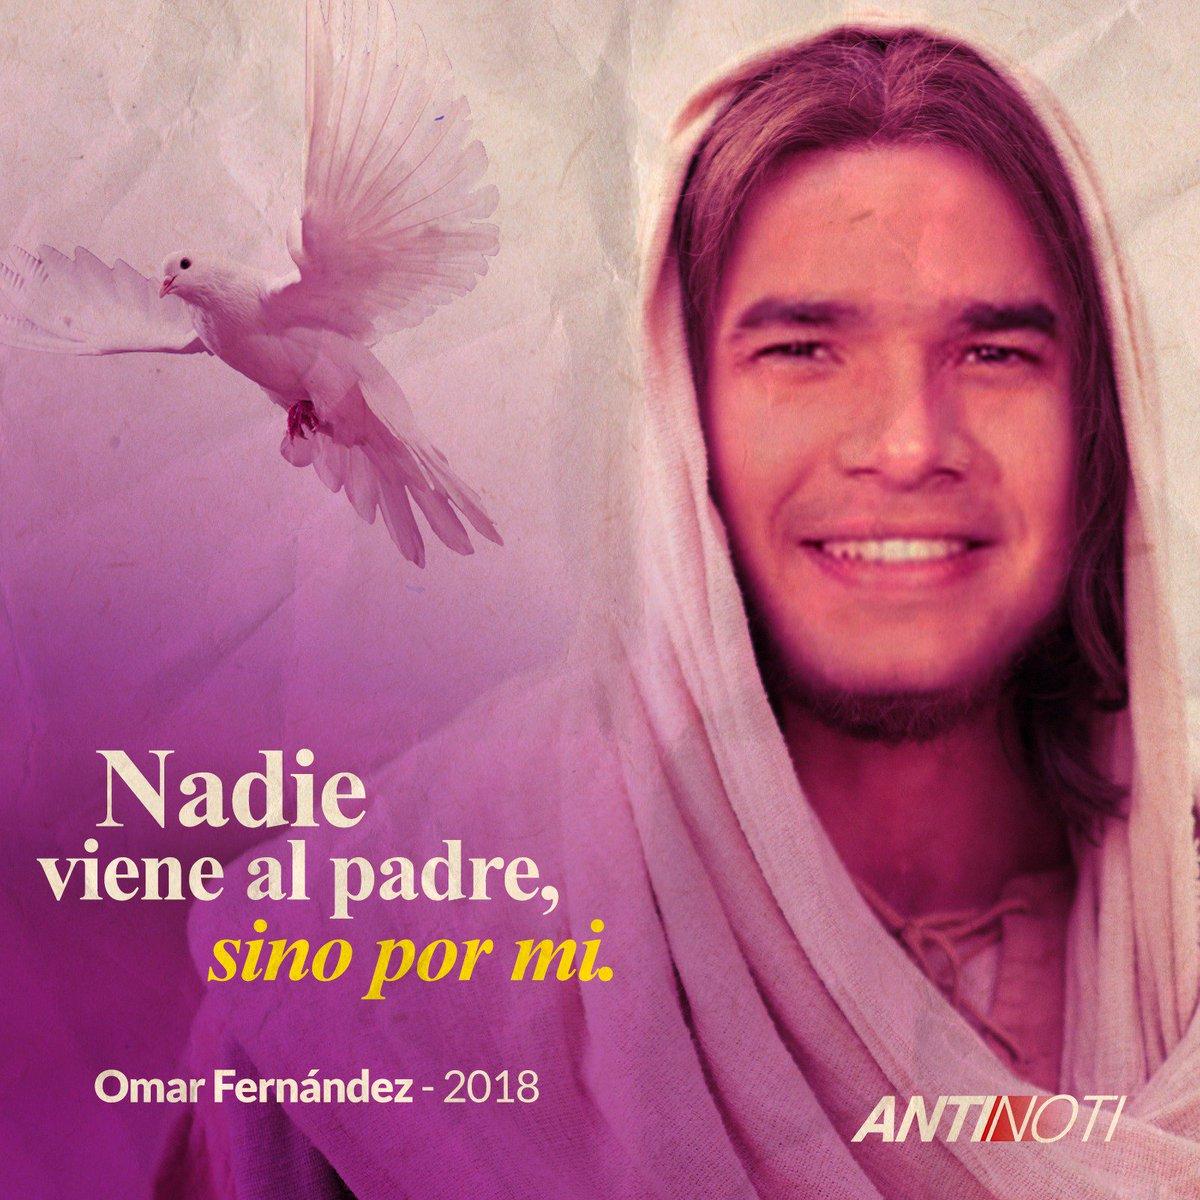 Sabias palabras @OmarLFernandez Cc: @elantinoti El padre: @LeonelFernandez